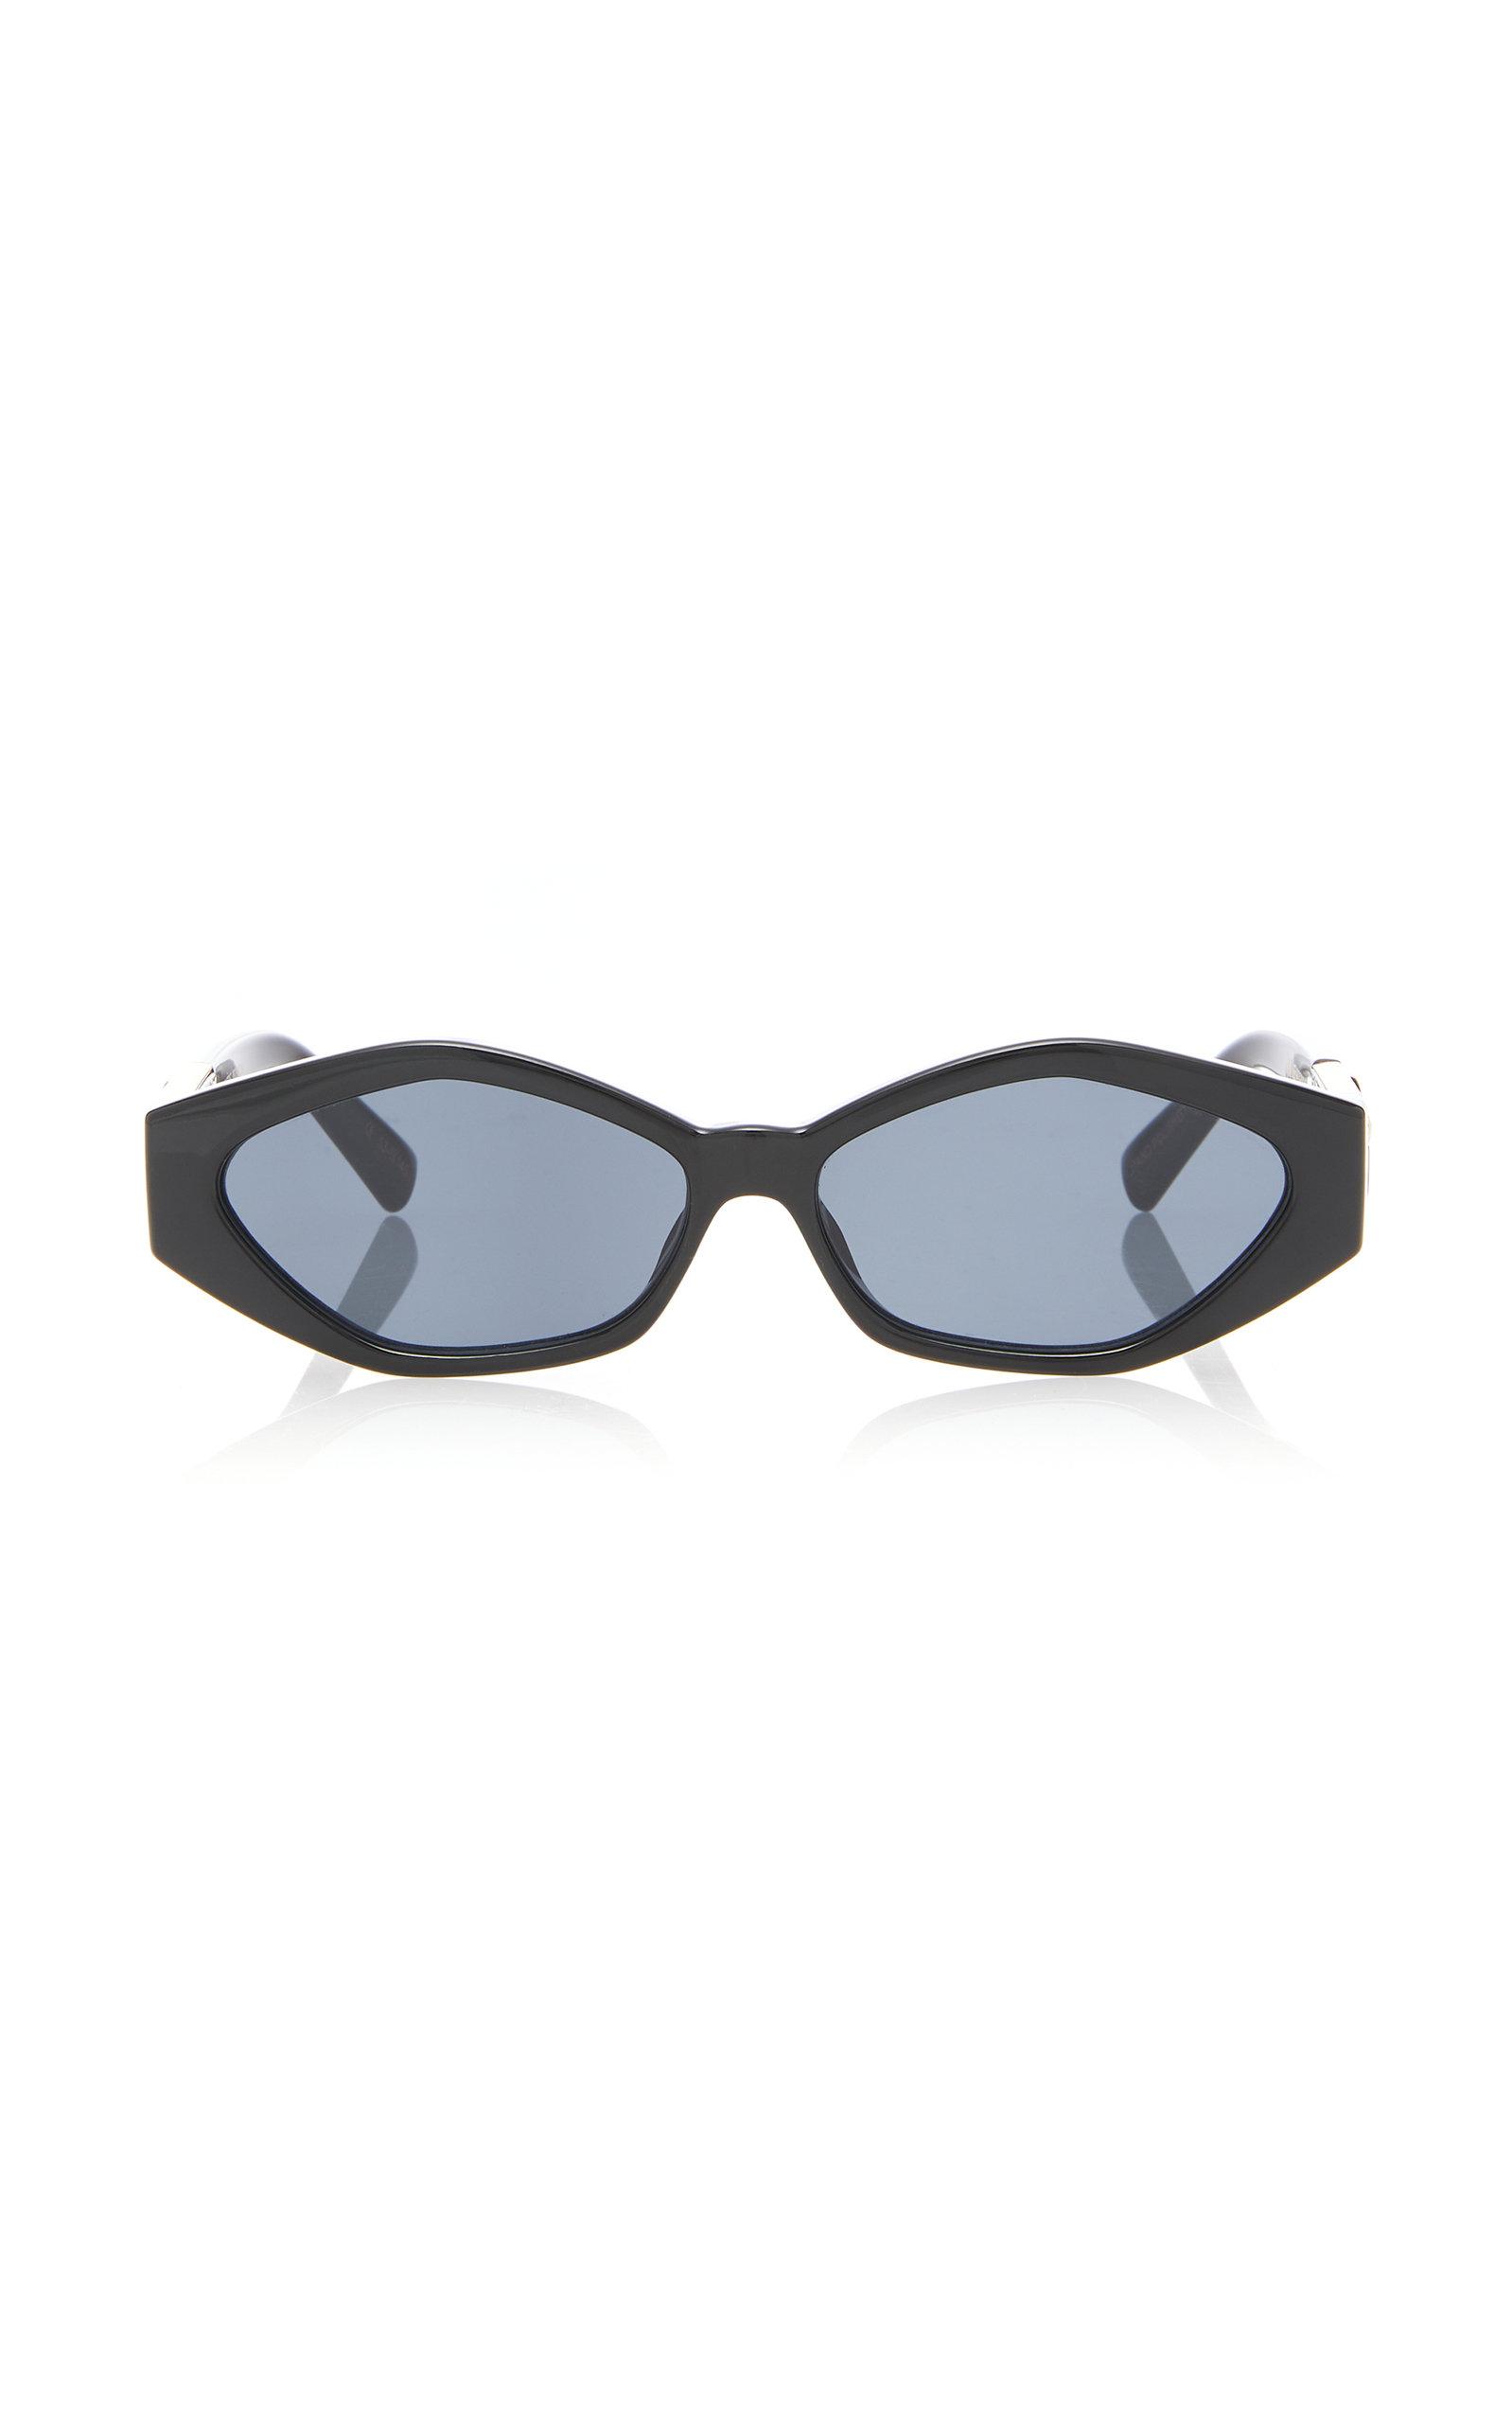 JORDAN ASKILL X LE SPECS LUXE Petit Panthère Sunglasses in Black